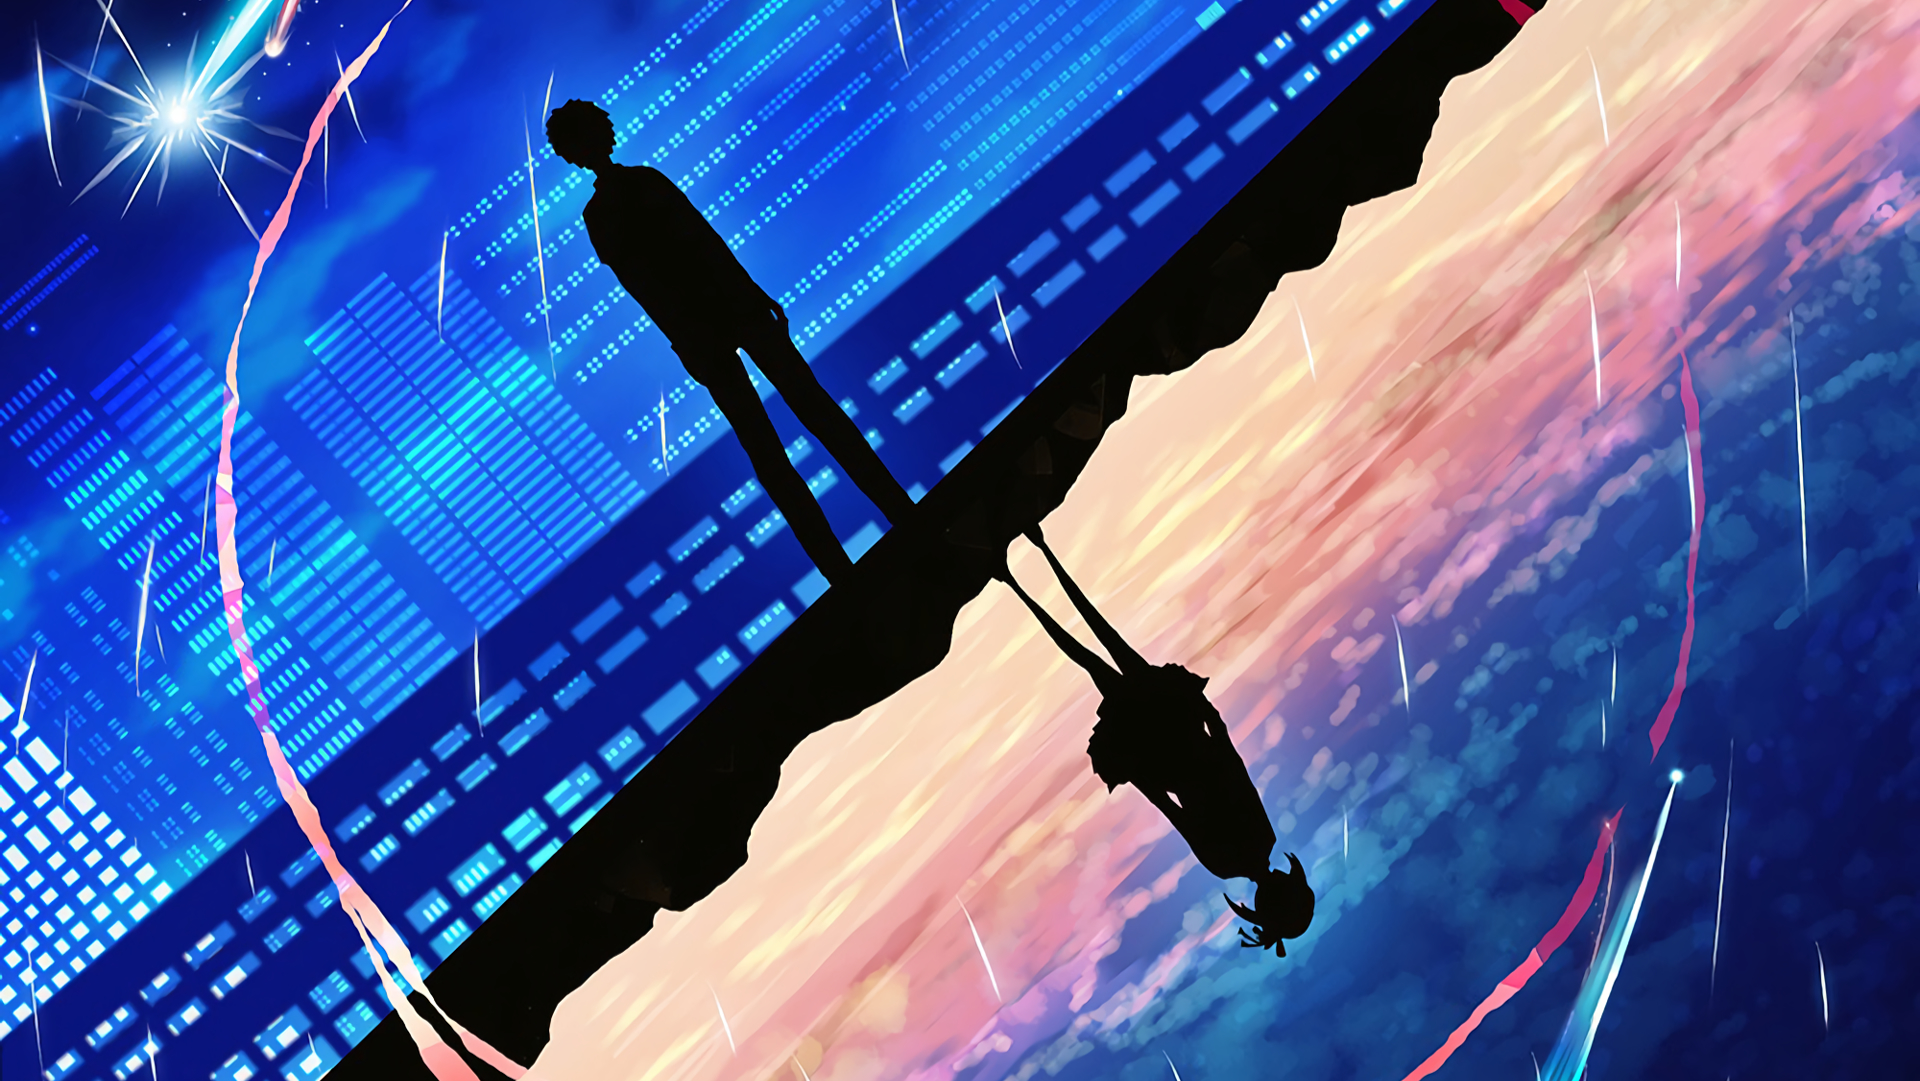 Kimi no Na wa Your Name Wallpaper HD Anime 4K Wallpapers 1920x1081